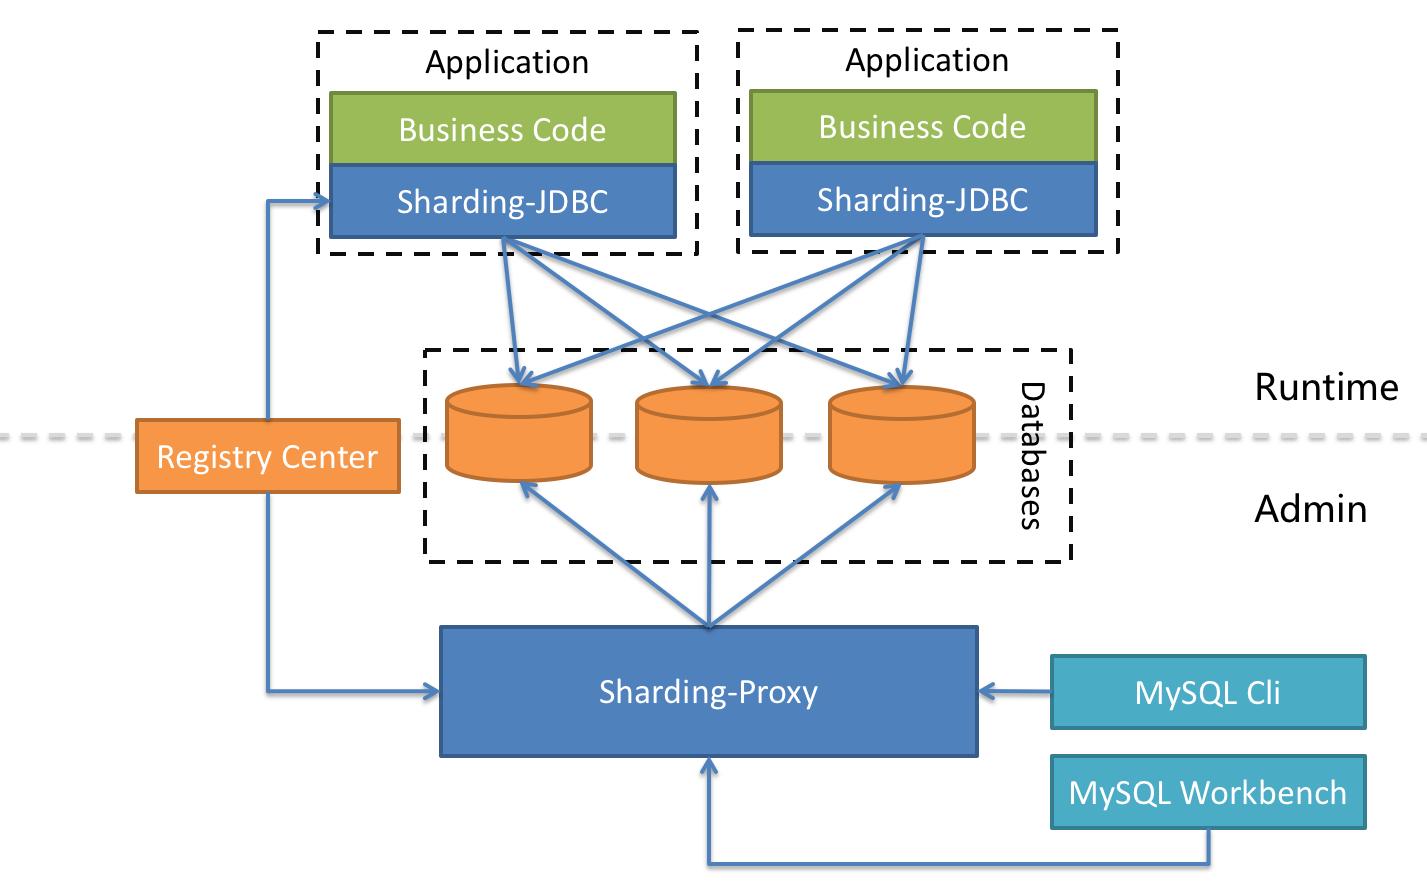 ShardingSphere Hybrid Architecture